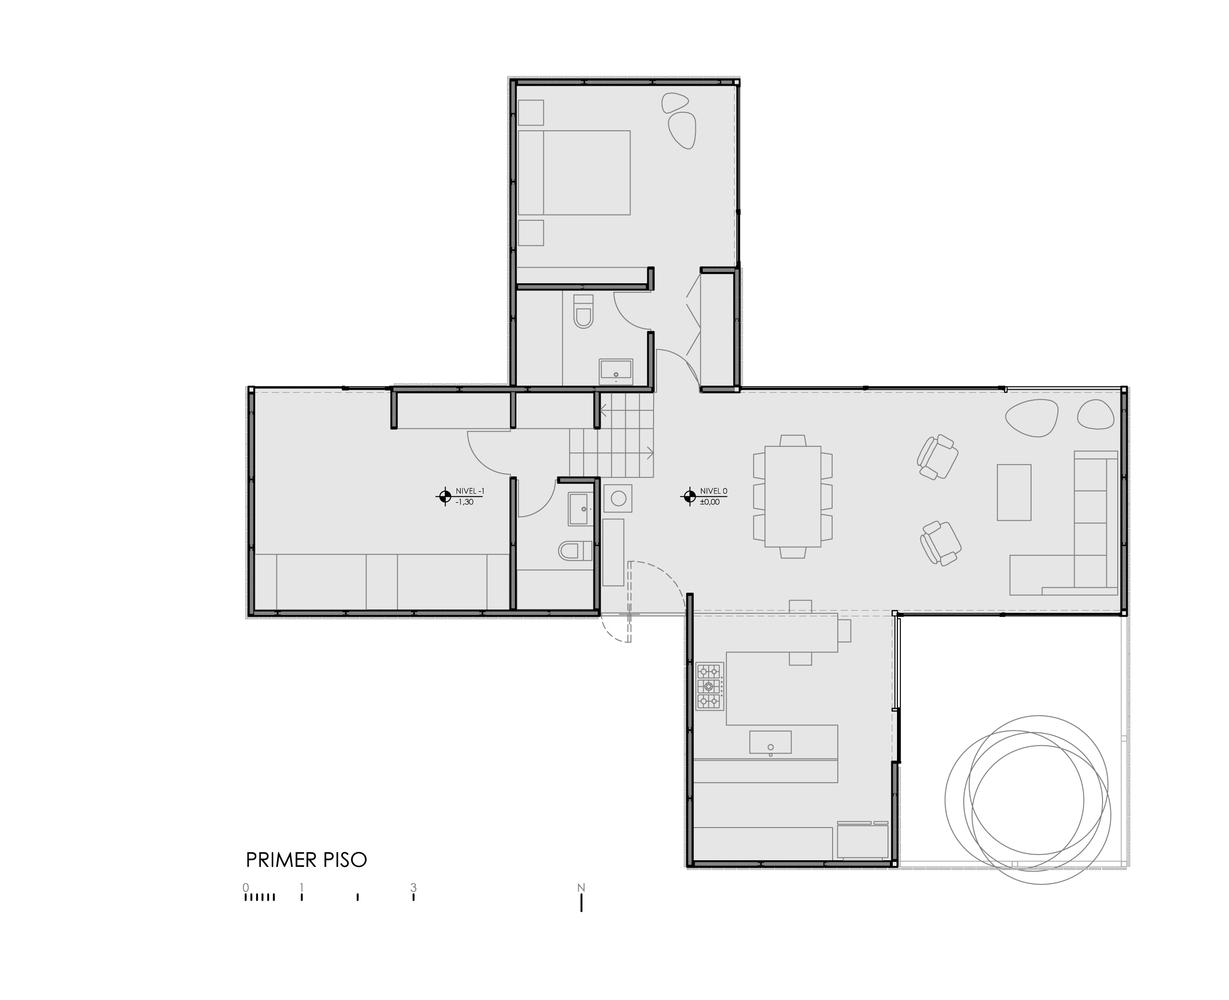 CML House / Ricardo Torrejon & Arturo Chadwick (9)